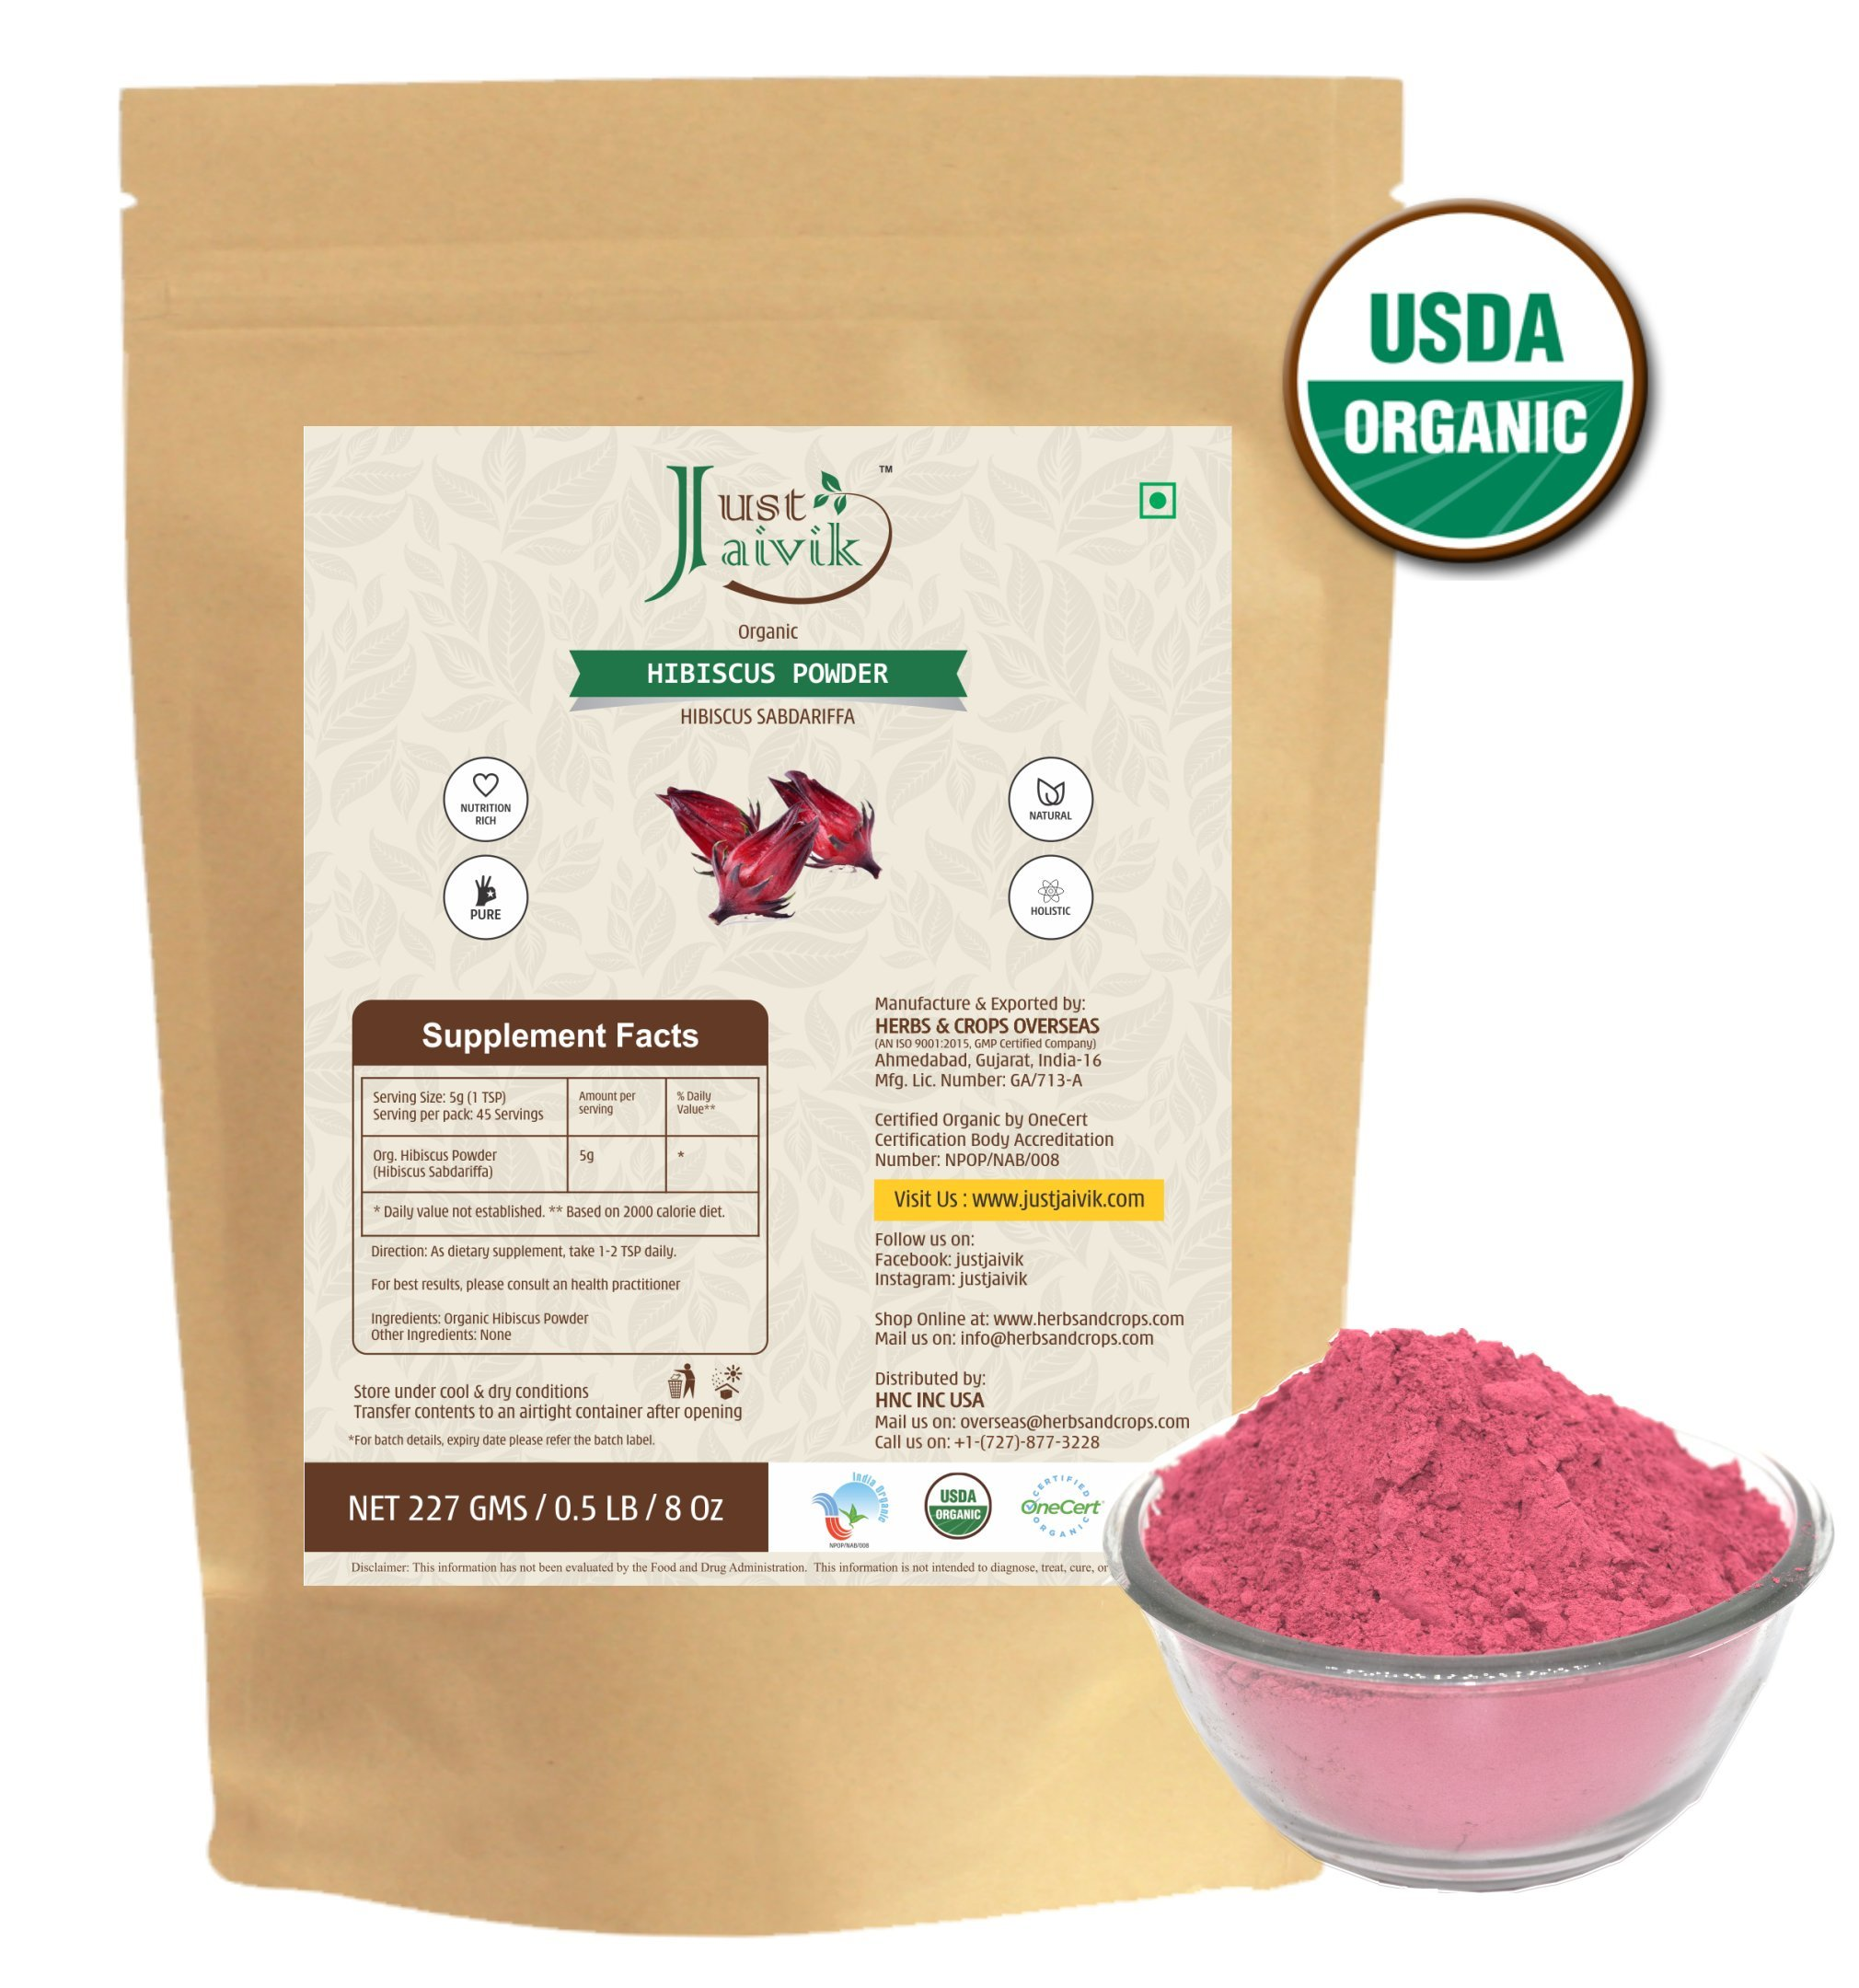 Just Jaivik 100% Organic Hibiscus Flower Powder (Hibiscus Sabdariffa) 1/2 LB, 08 oz, 227g USDA Certified Organic- Biodegradable Resealable Zip Lock Pouch